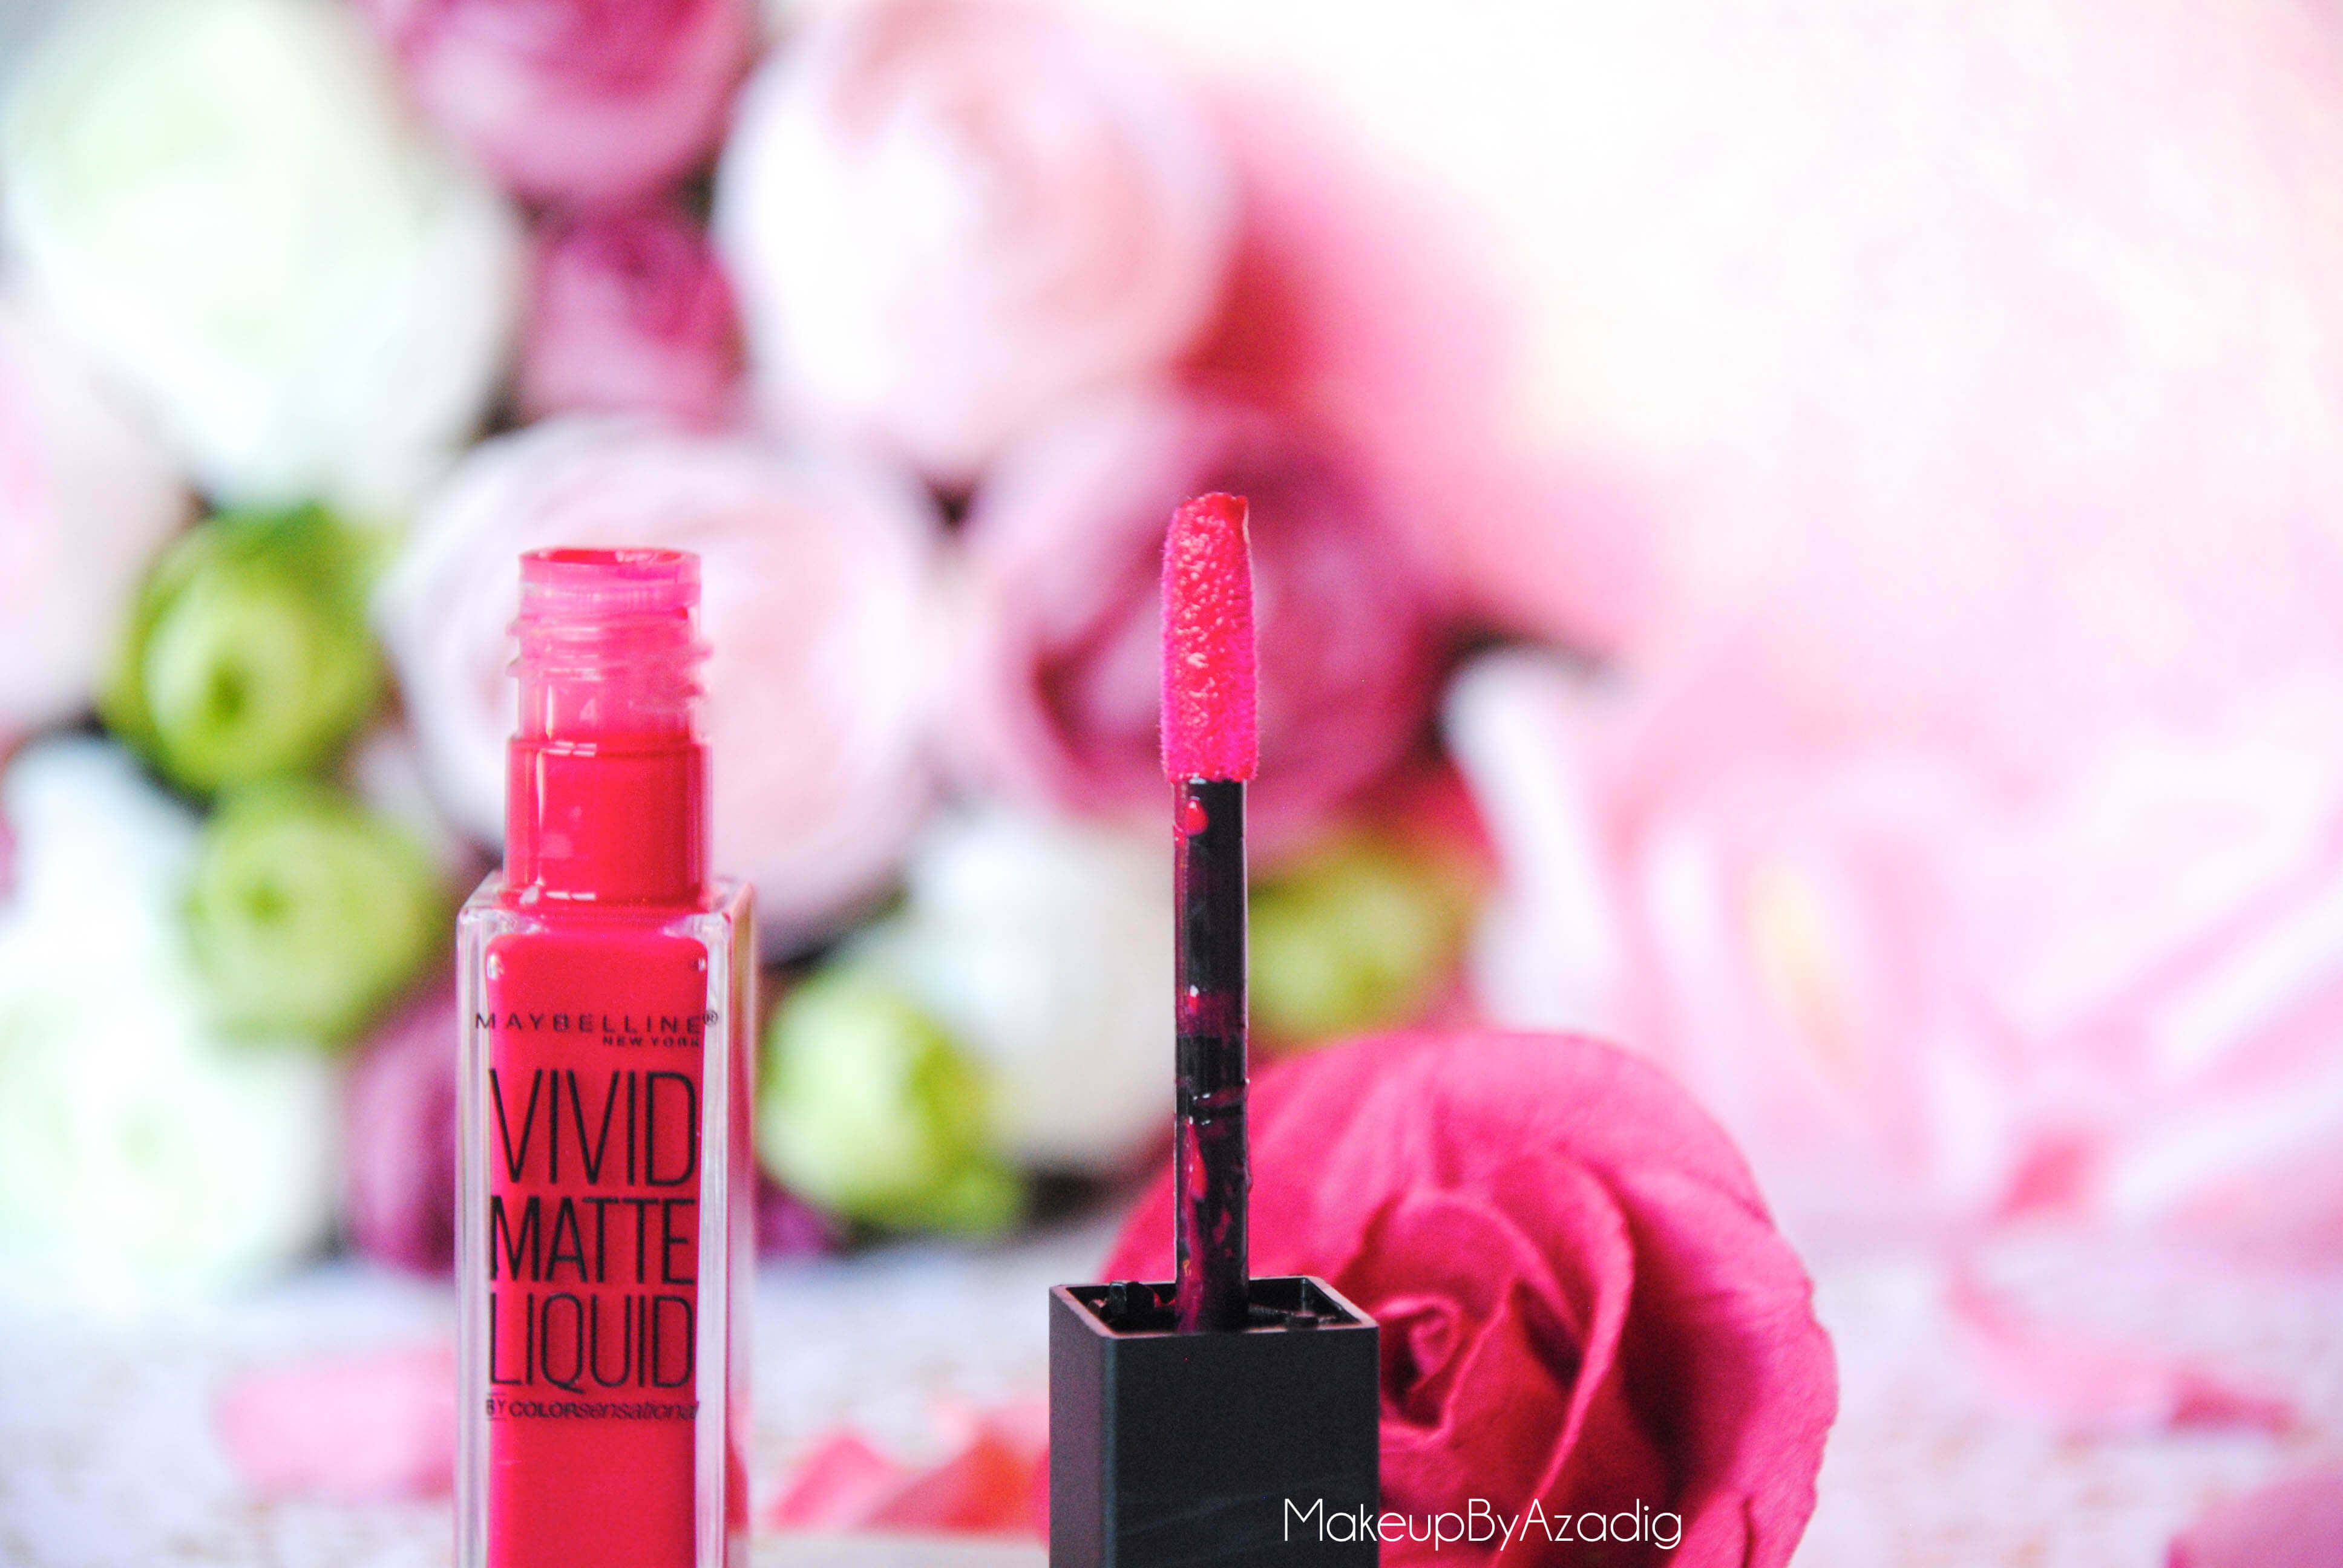 makeupbyazadig-troyes-gemey-maybelline-new-york-nude-flush-orange-shot-possessed-plum-berry-boost-fuchsia-ecstasy-corail-courage-vivid-matte-liquid-by-colorsensational-blog